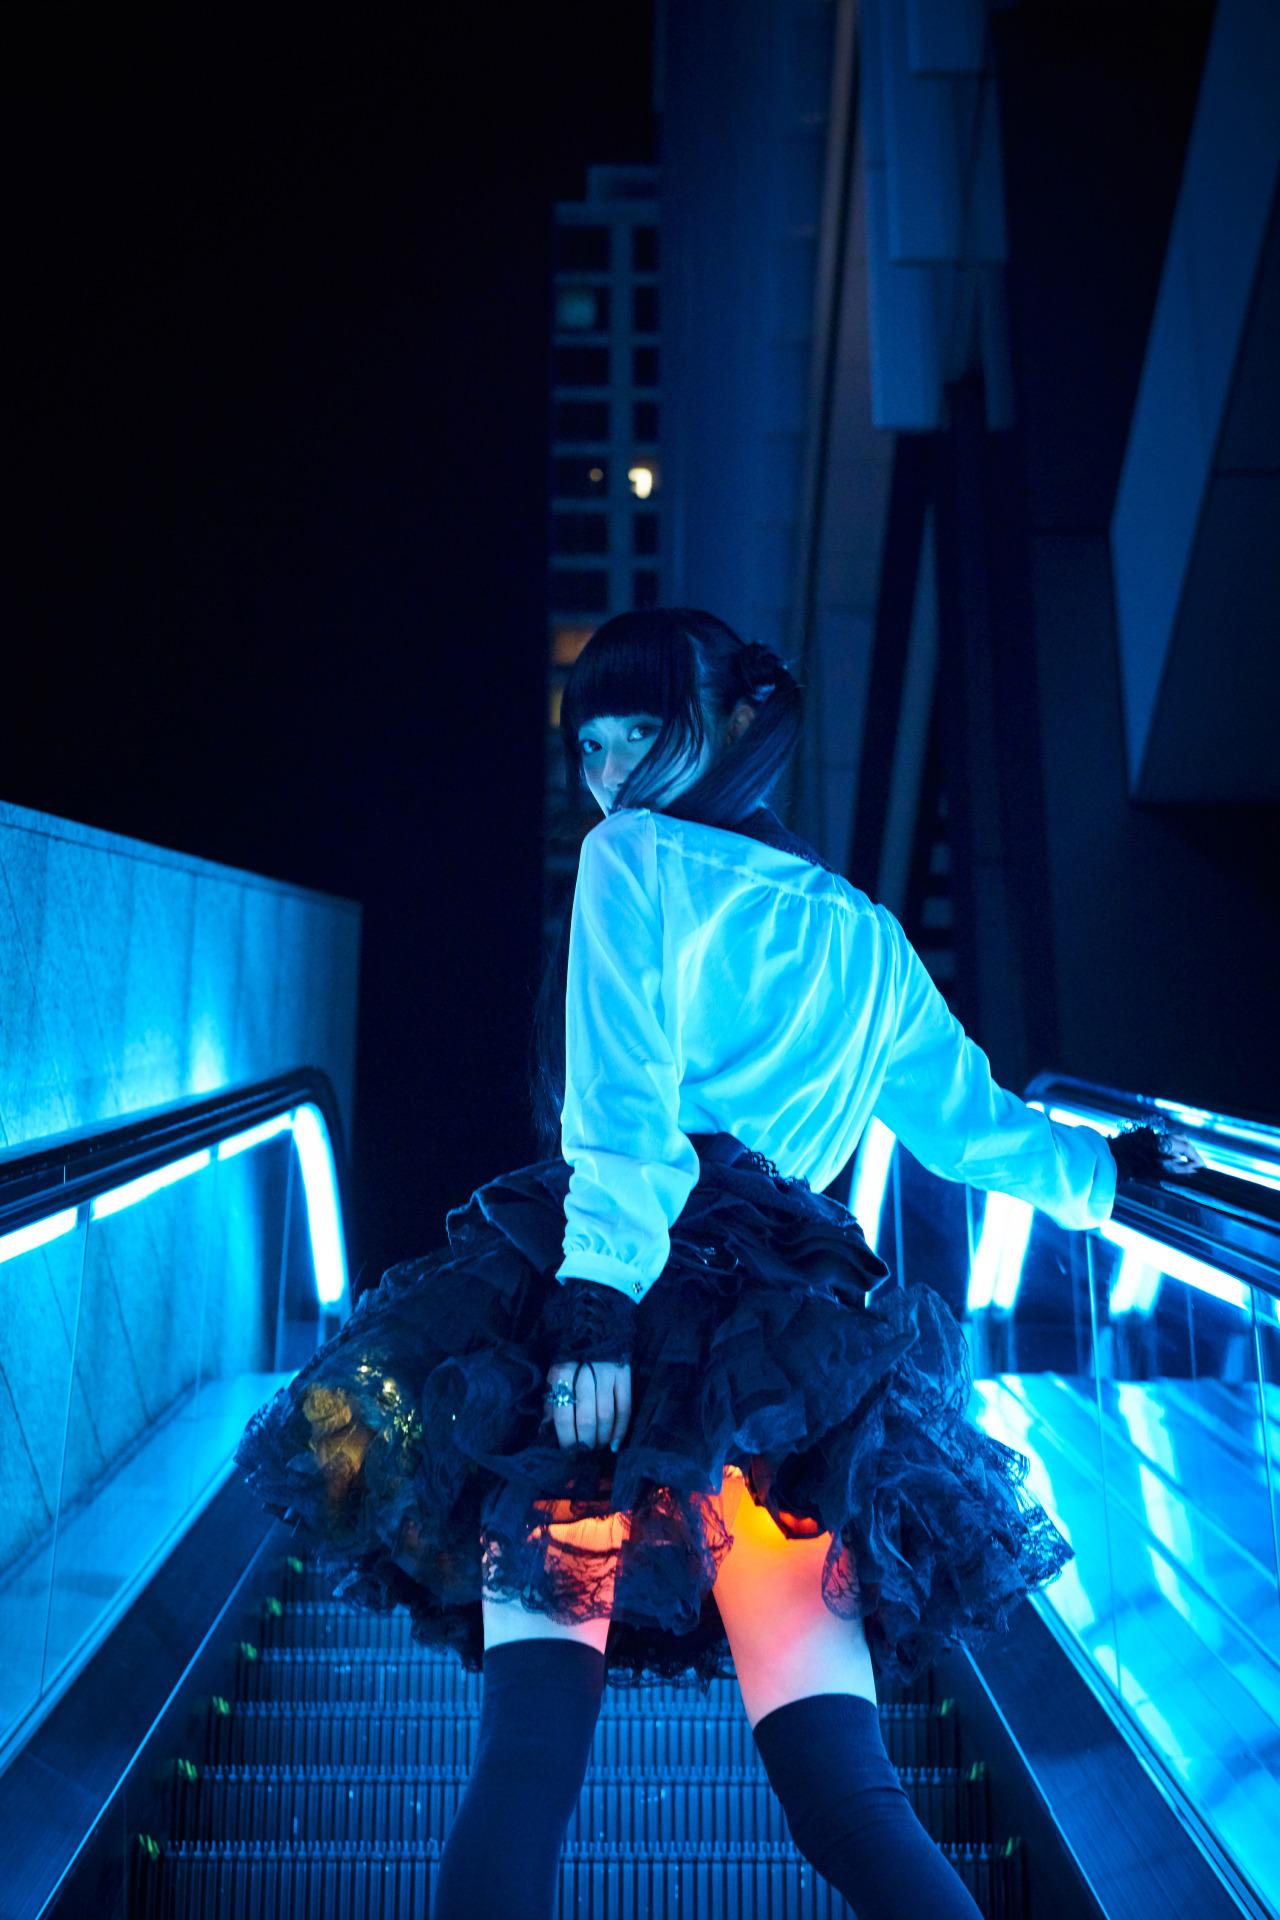 hikaru skirt zettai ryoiki otaku kayac amano moso calibration flashing music idol japan